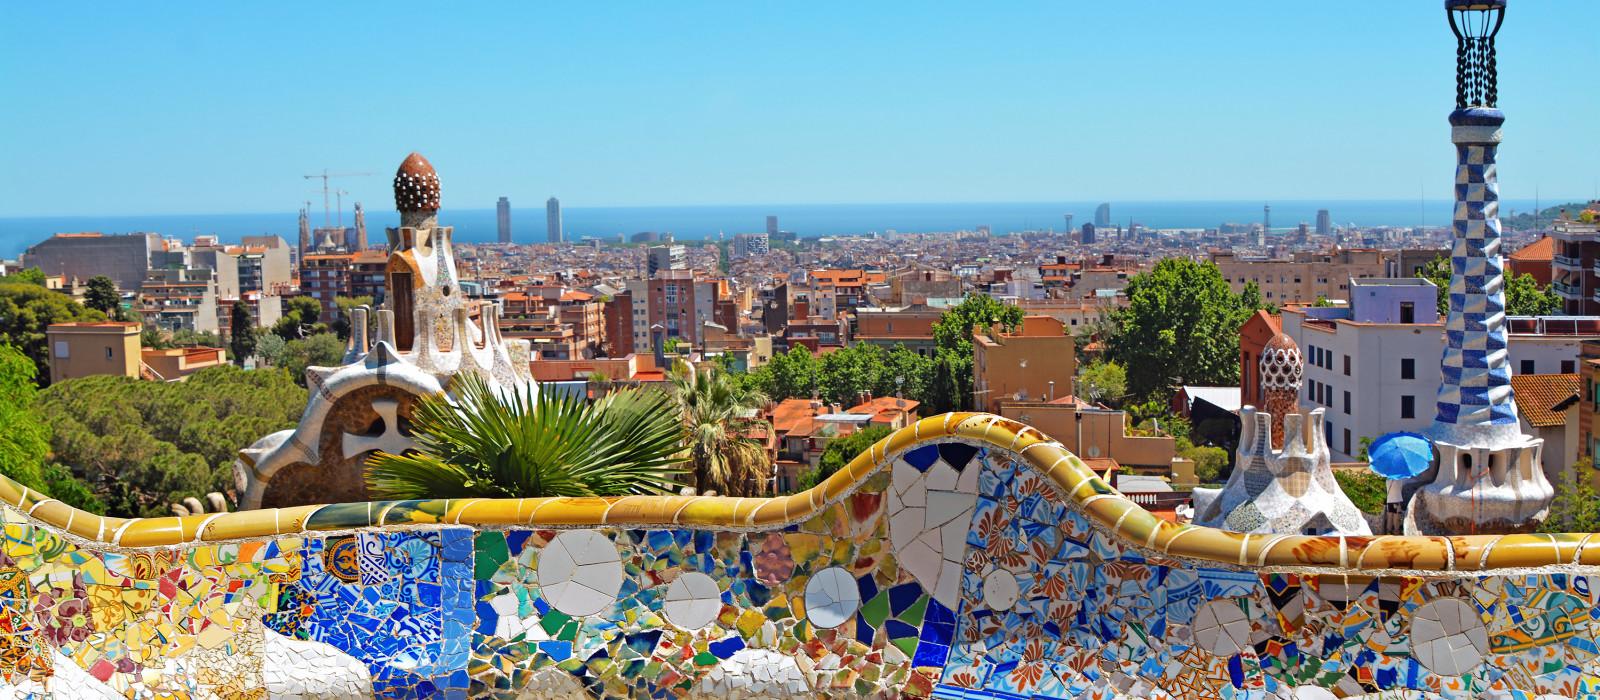 Destination Barcelona Spain